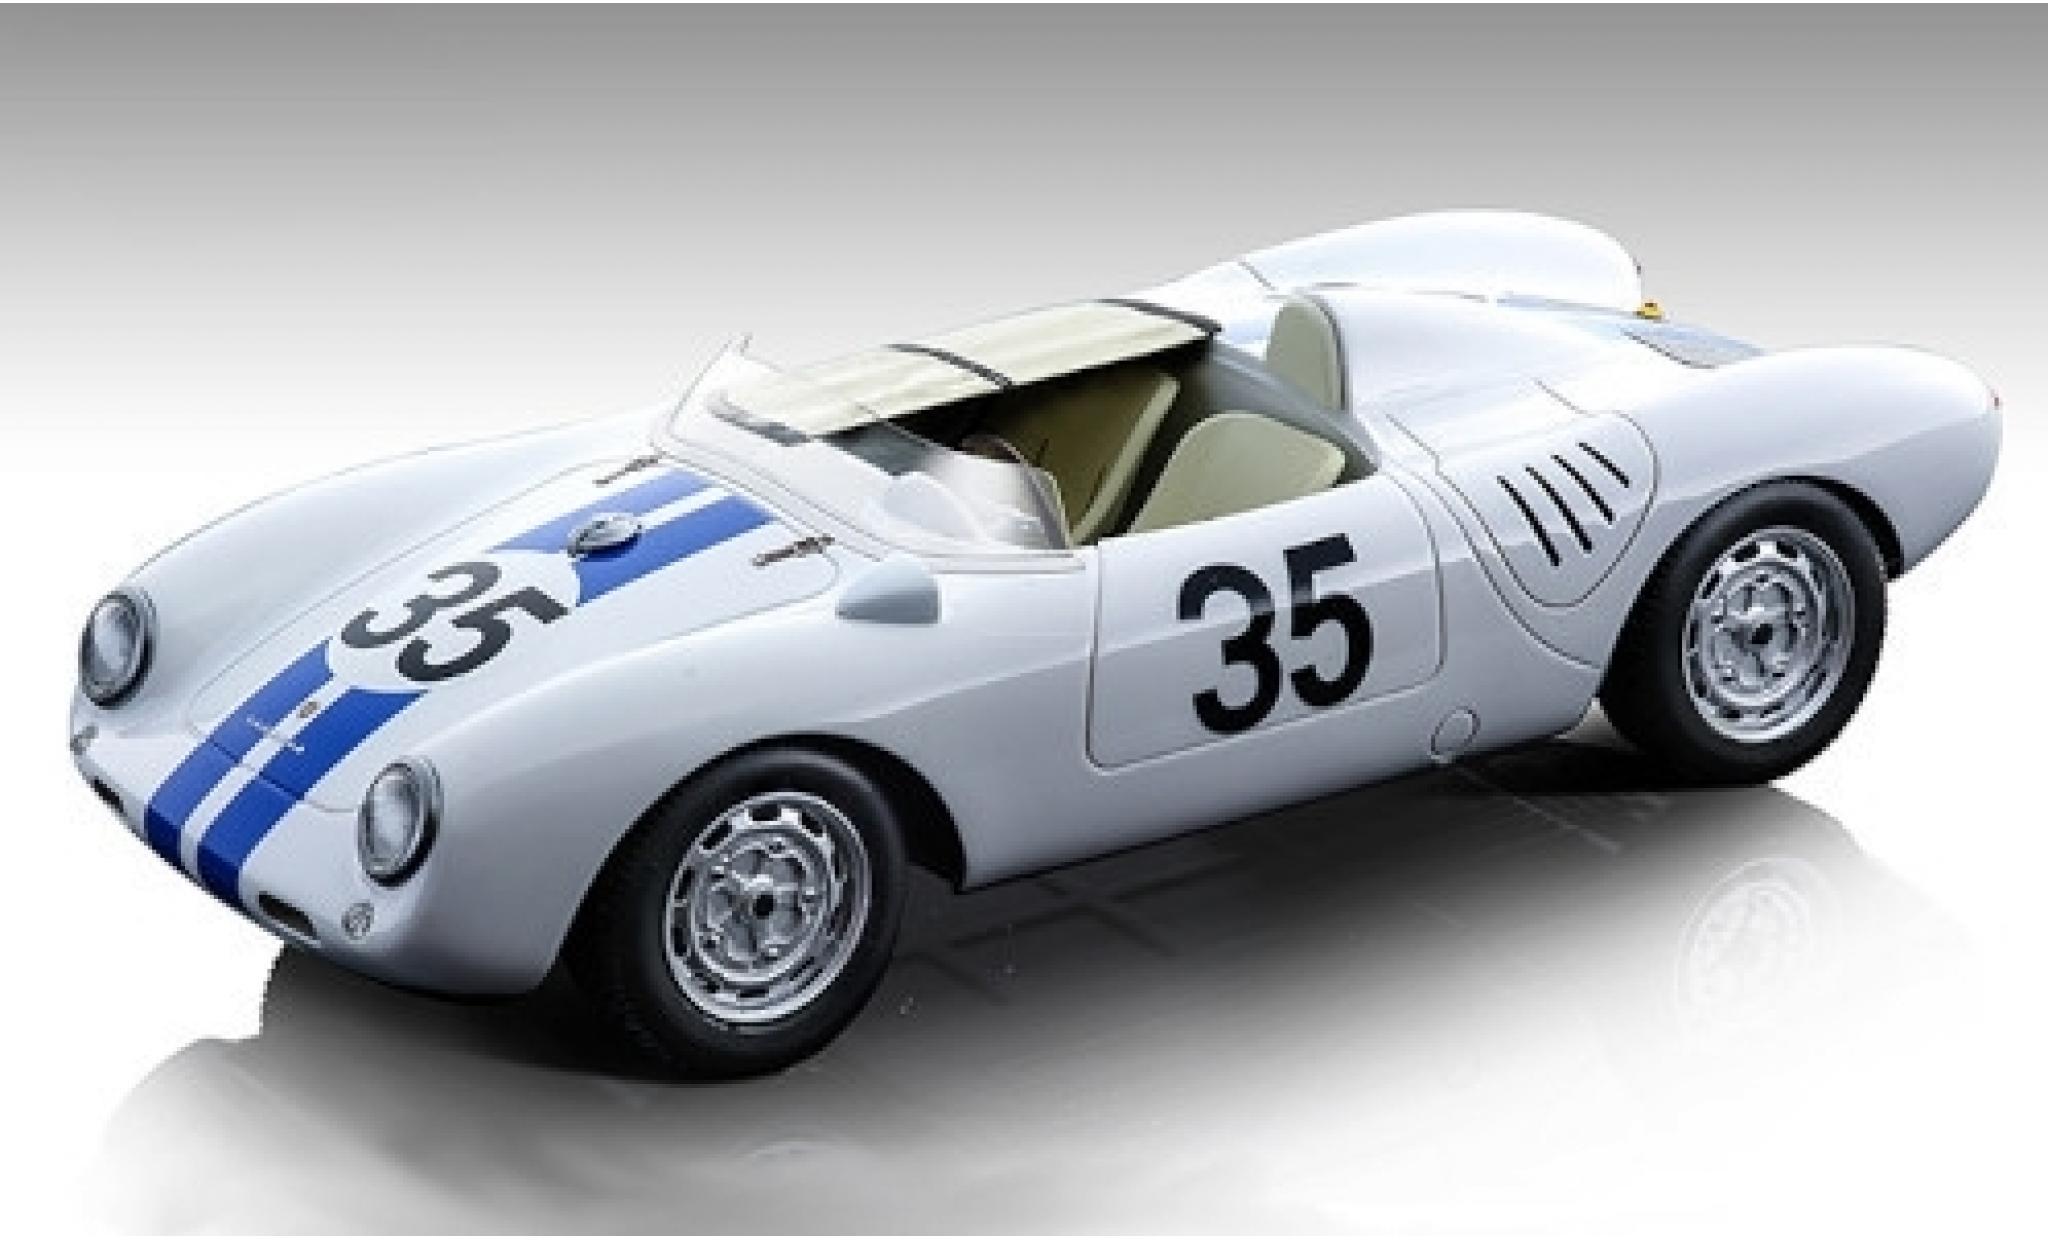 Porsche 550 1/18 Tecnomodel A RS No.35 Ed Hugus 24h Le Mans 1957 E.Hugus/C.Godin de Beaufort